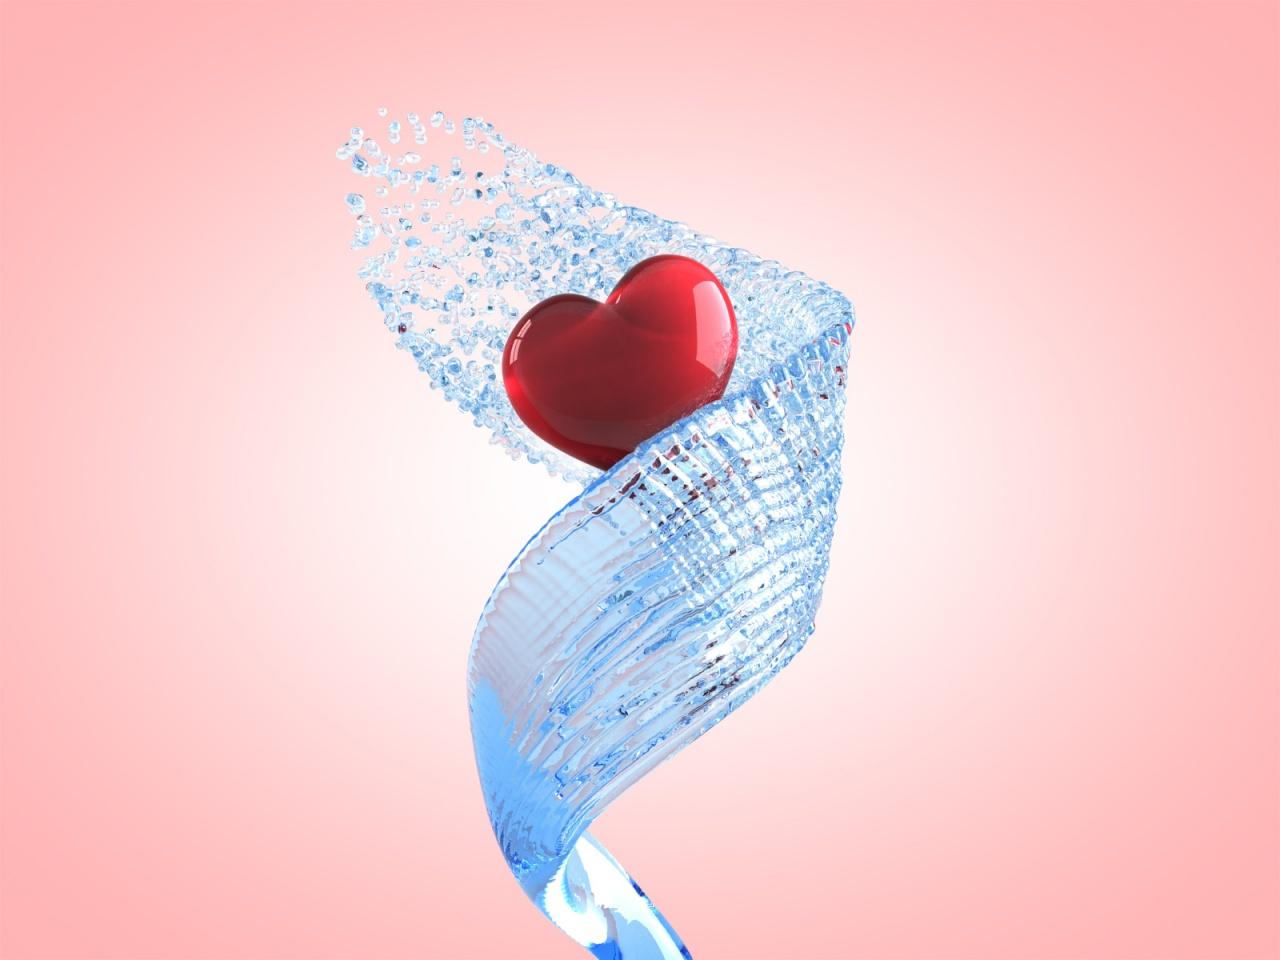 Ngdjwsuwc Wallpapers List 9 Free Hd Desktop Wallpapers Download About Romance Heart Love